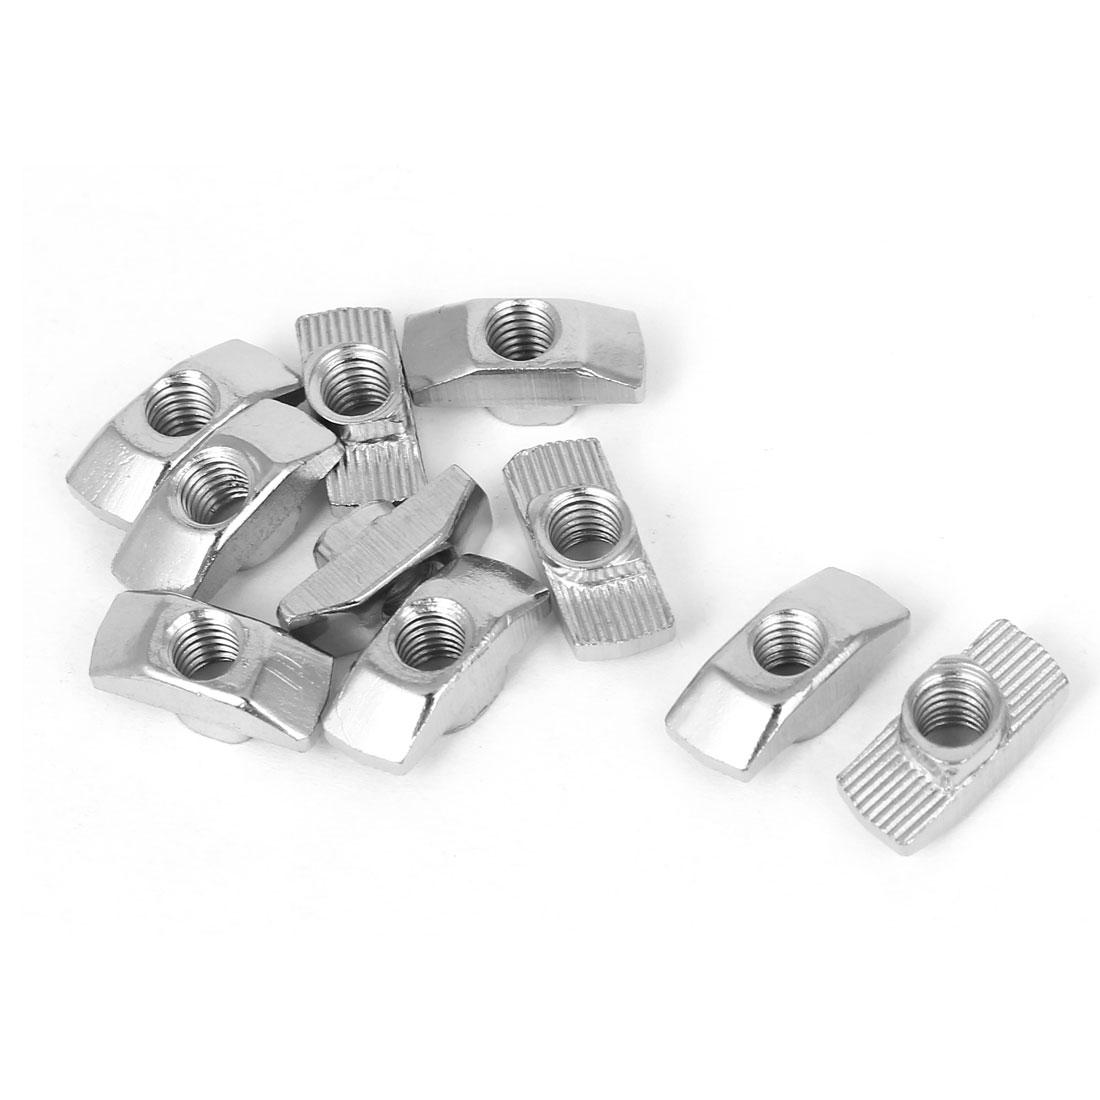 10pcs 4040 Series Aluminum Profiles Extrusion T Slot Nuts M6 Drop in T-Nuts